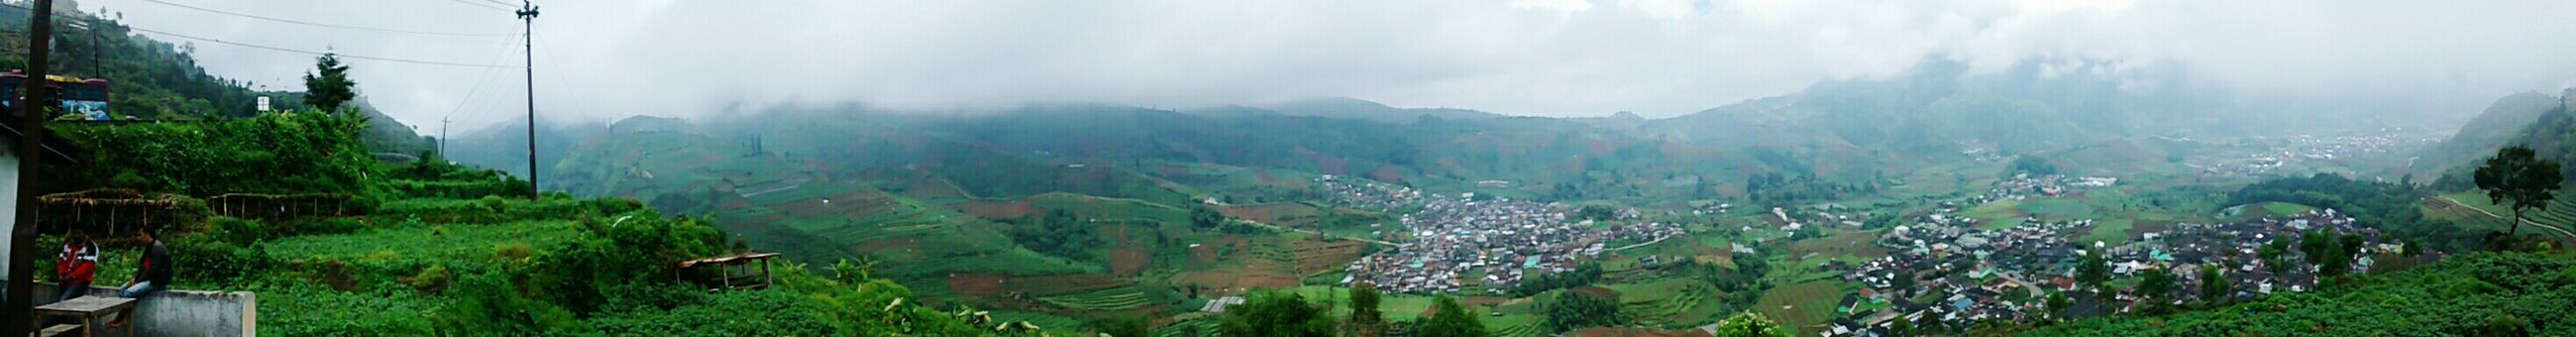 The view in Tieng, Wonosobo. 1789m above the sea level in my town. Taken with motorola moto g camera (panorama). Location : Dieng, Indonesia Wonosobo Eyeemindonesia EyeEm Nature Lover Mountain Nature Panoramic View